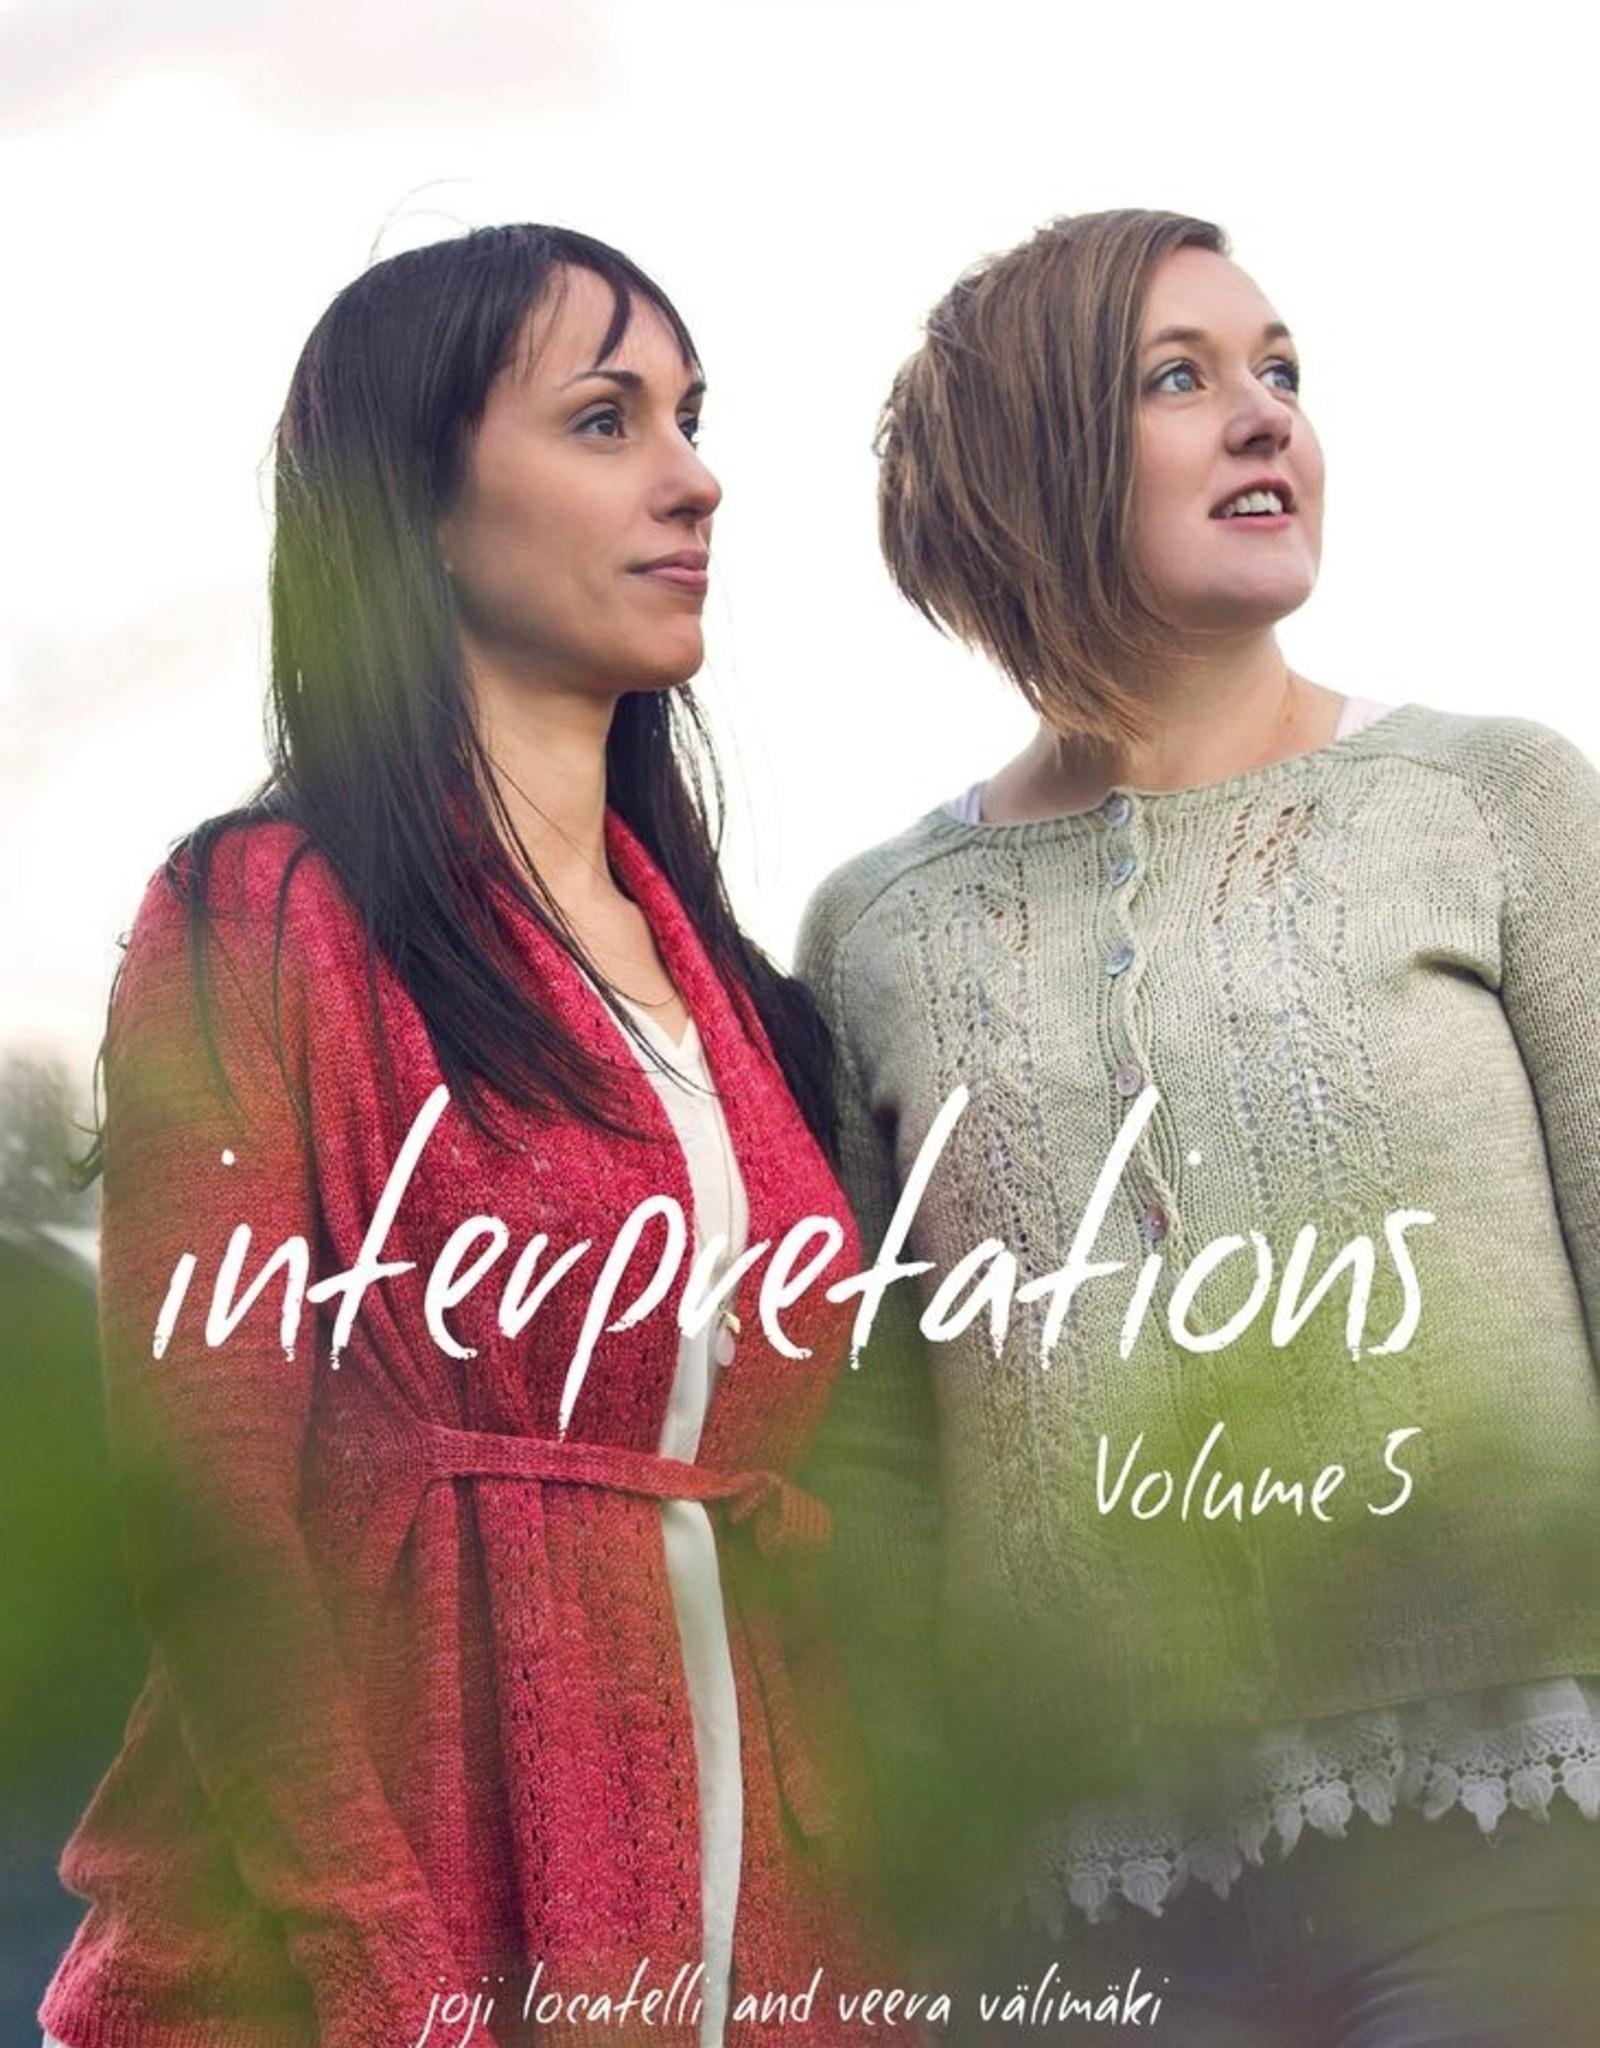 Pom Pom Interpretations: Volume 5